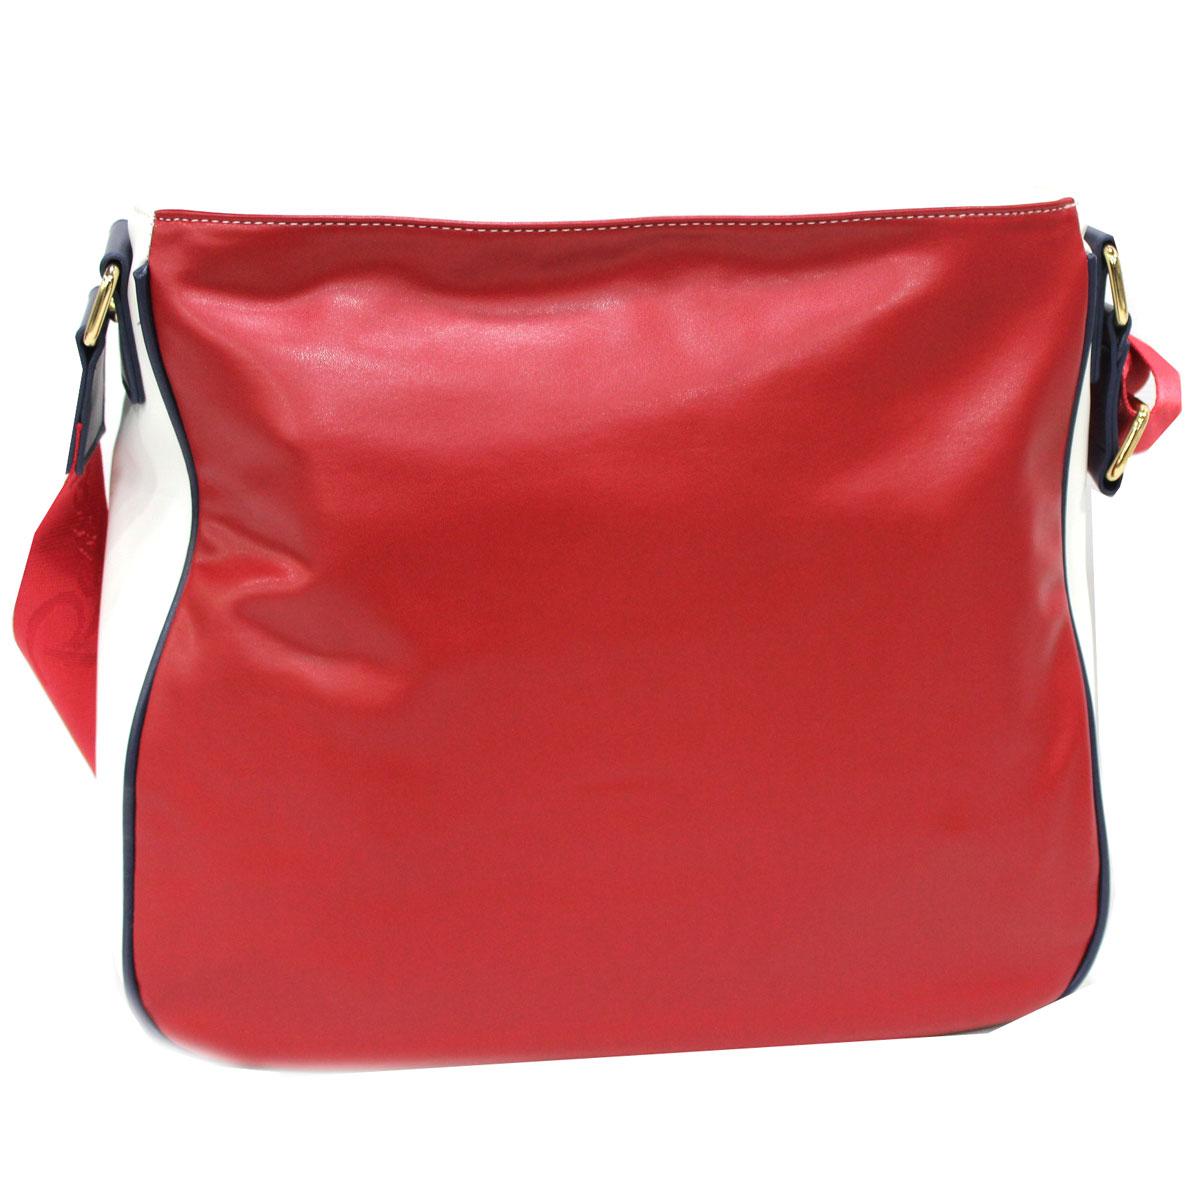 Details about  /Renato Balestra women/'s shoulder bag Fergus line 102-7 sand